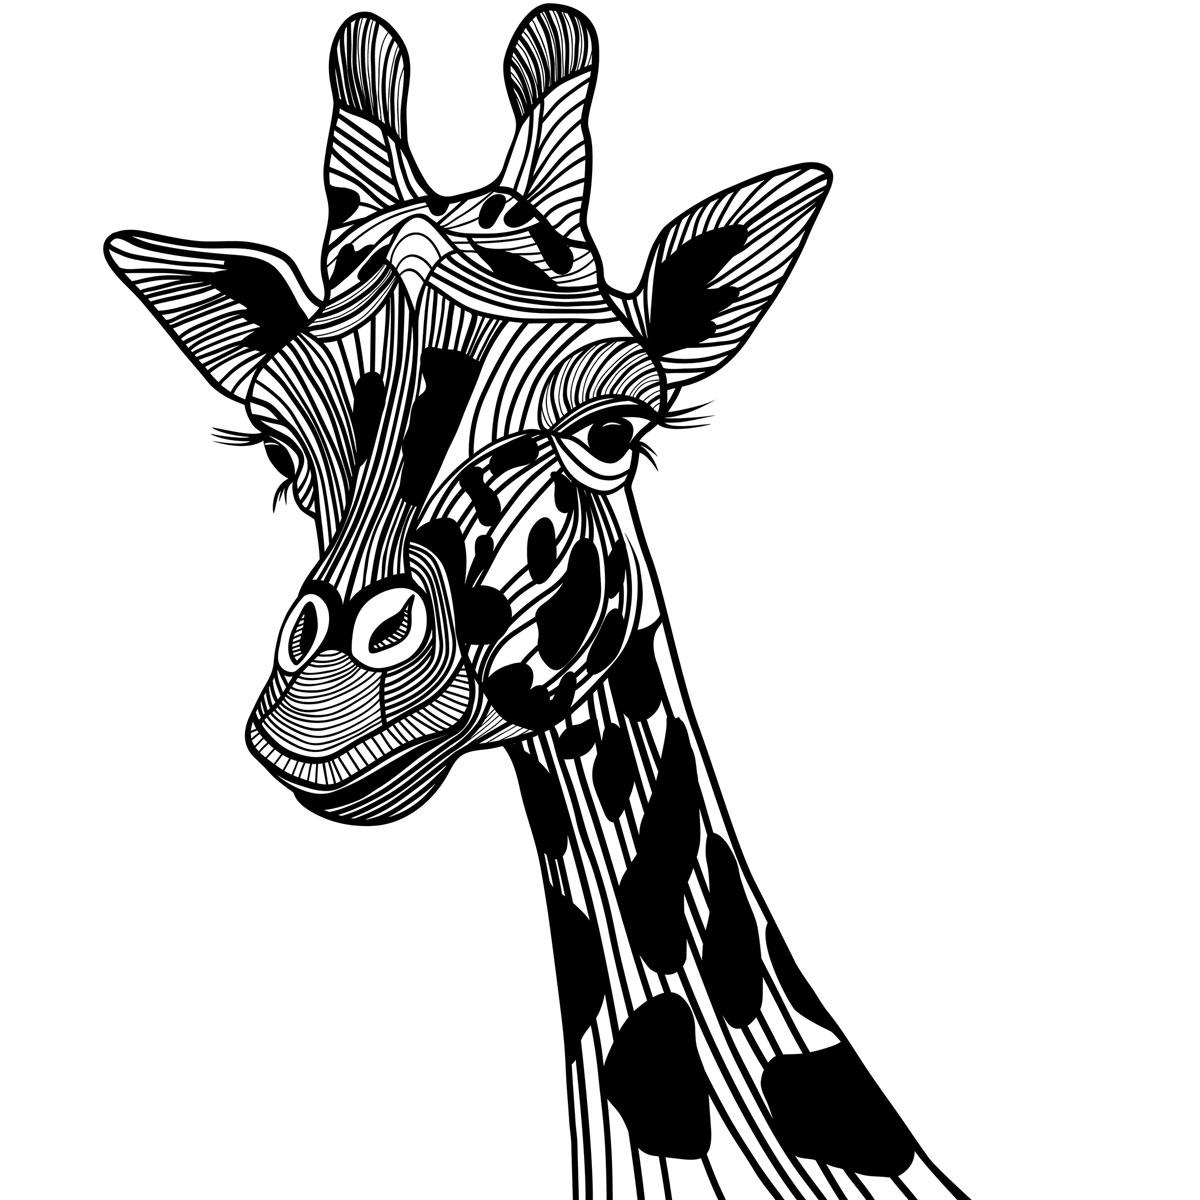 11 Most Famous Giraffe Tattoo Designs